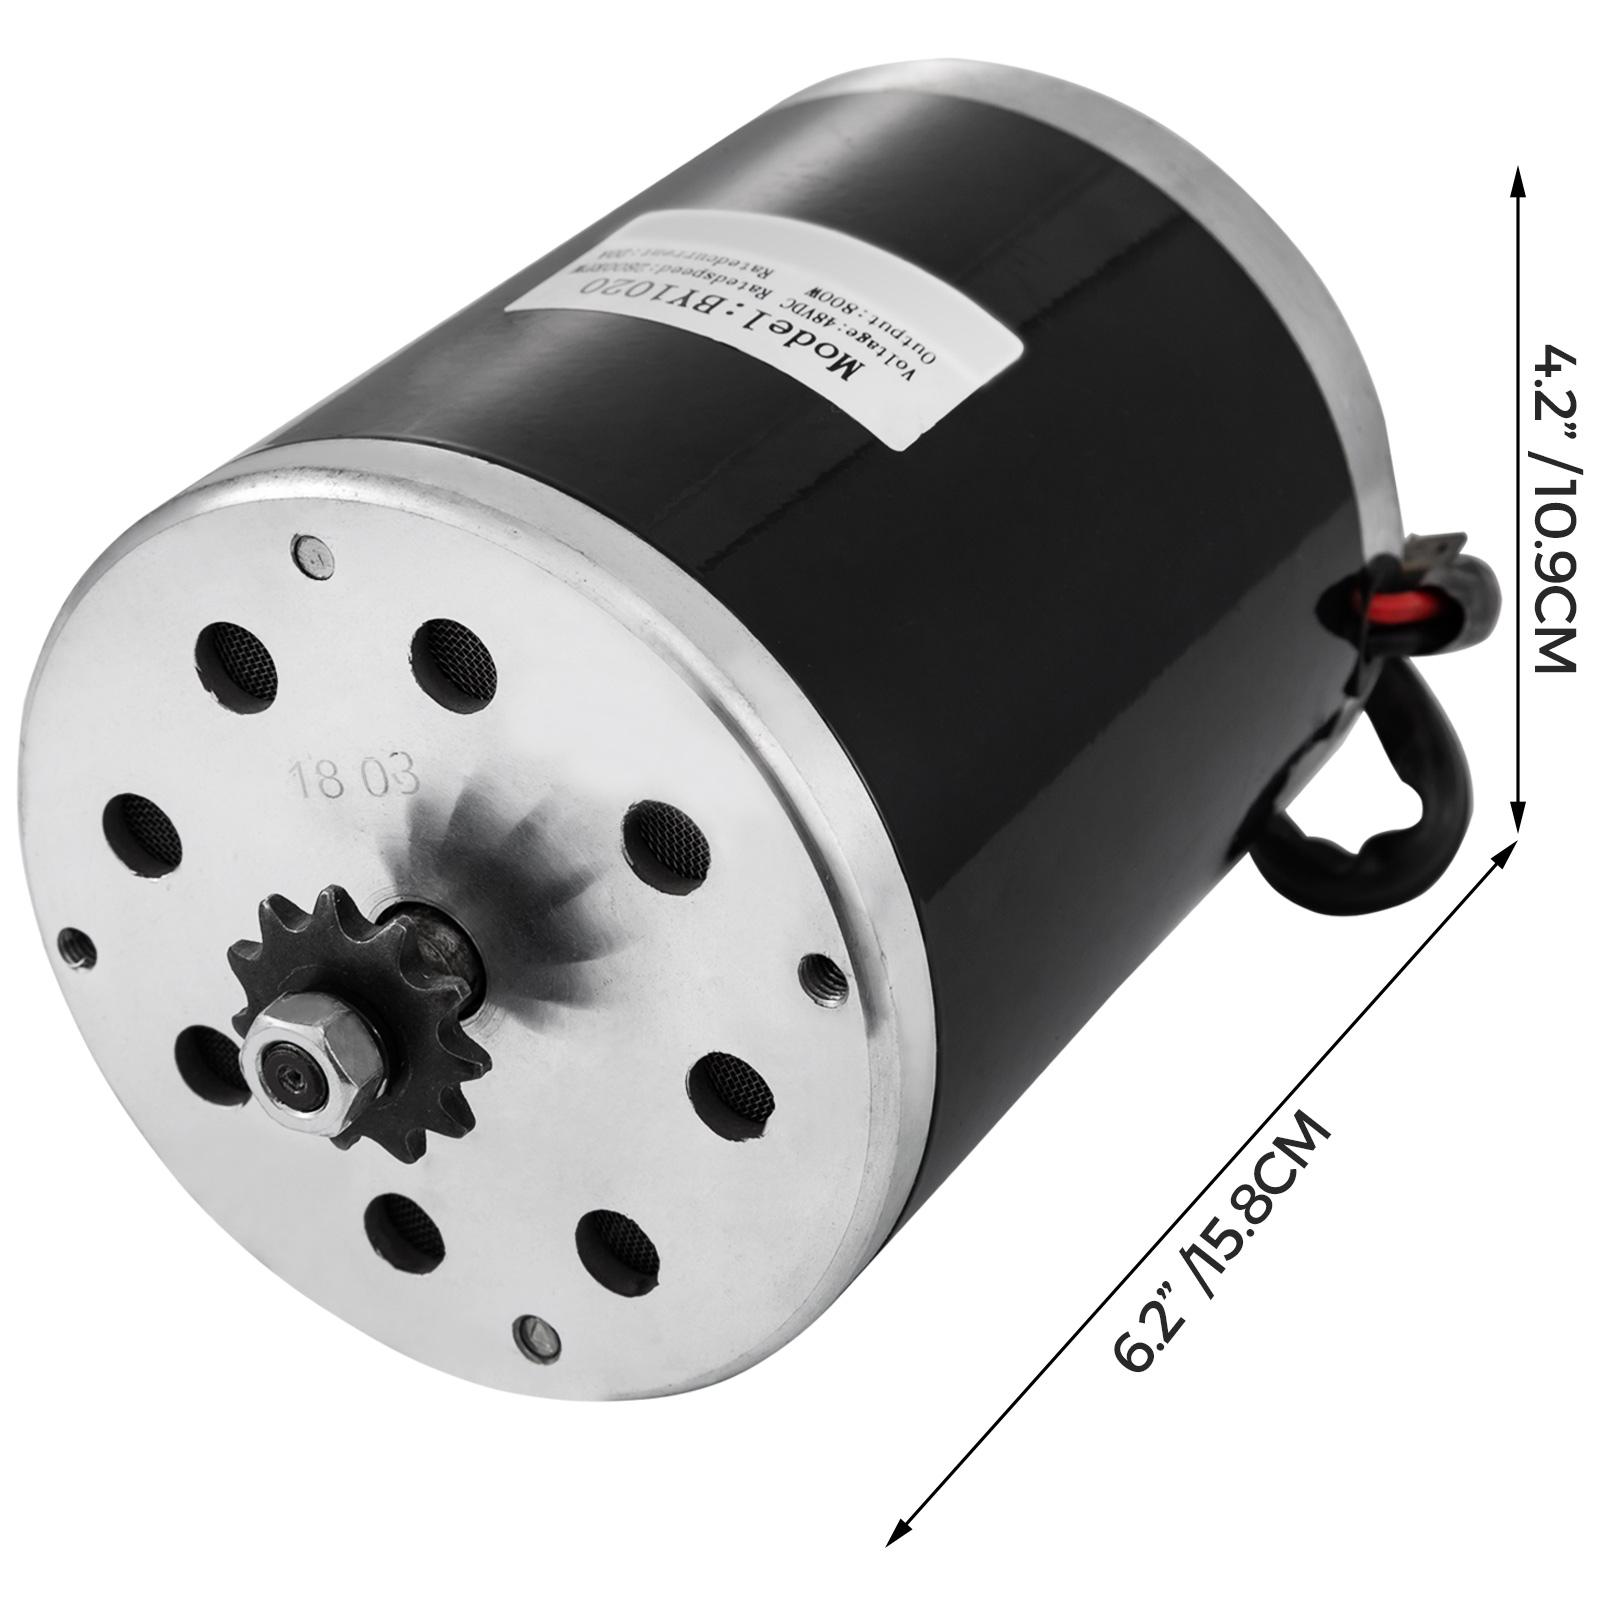 1800W-48V-DC-Brushless-Electric-Motor-Kit-f-Scooter-500-1800W-E-Bike-Go-Kart thumbnail 20